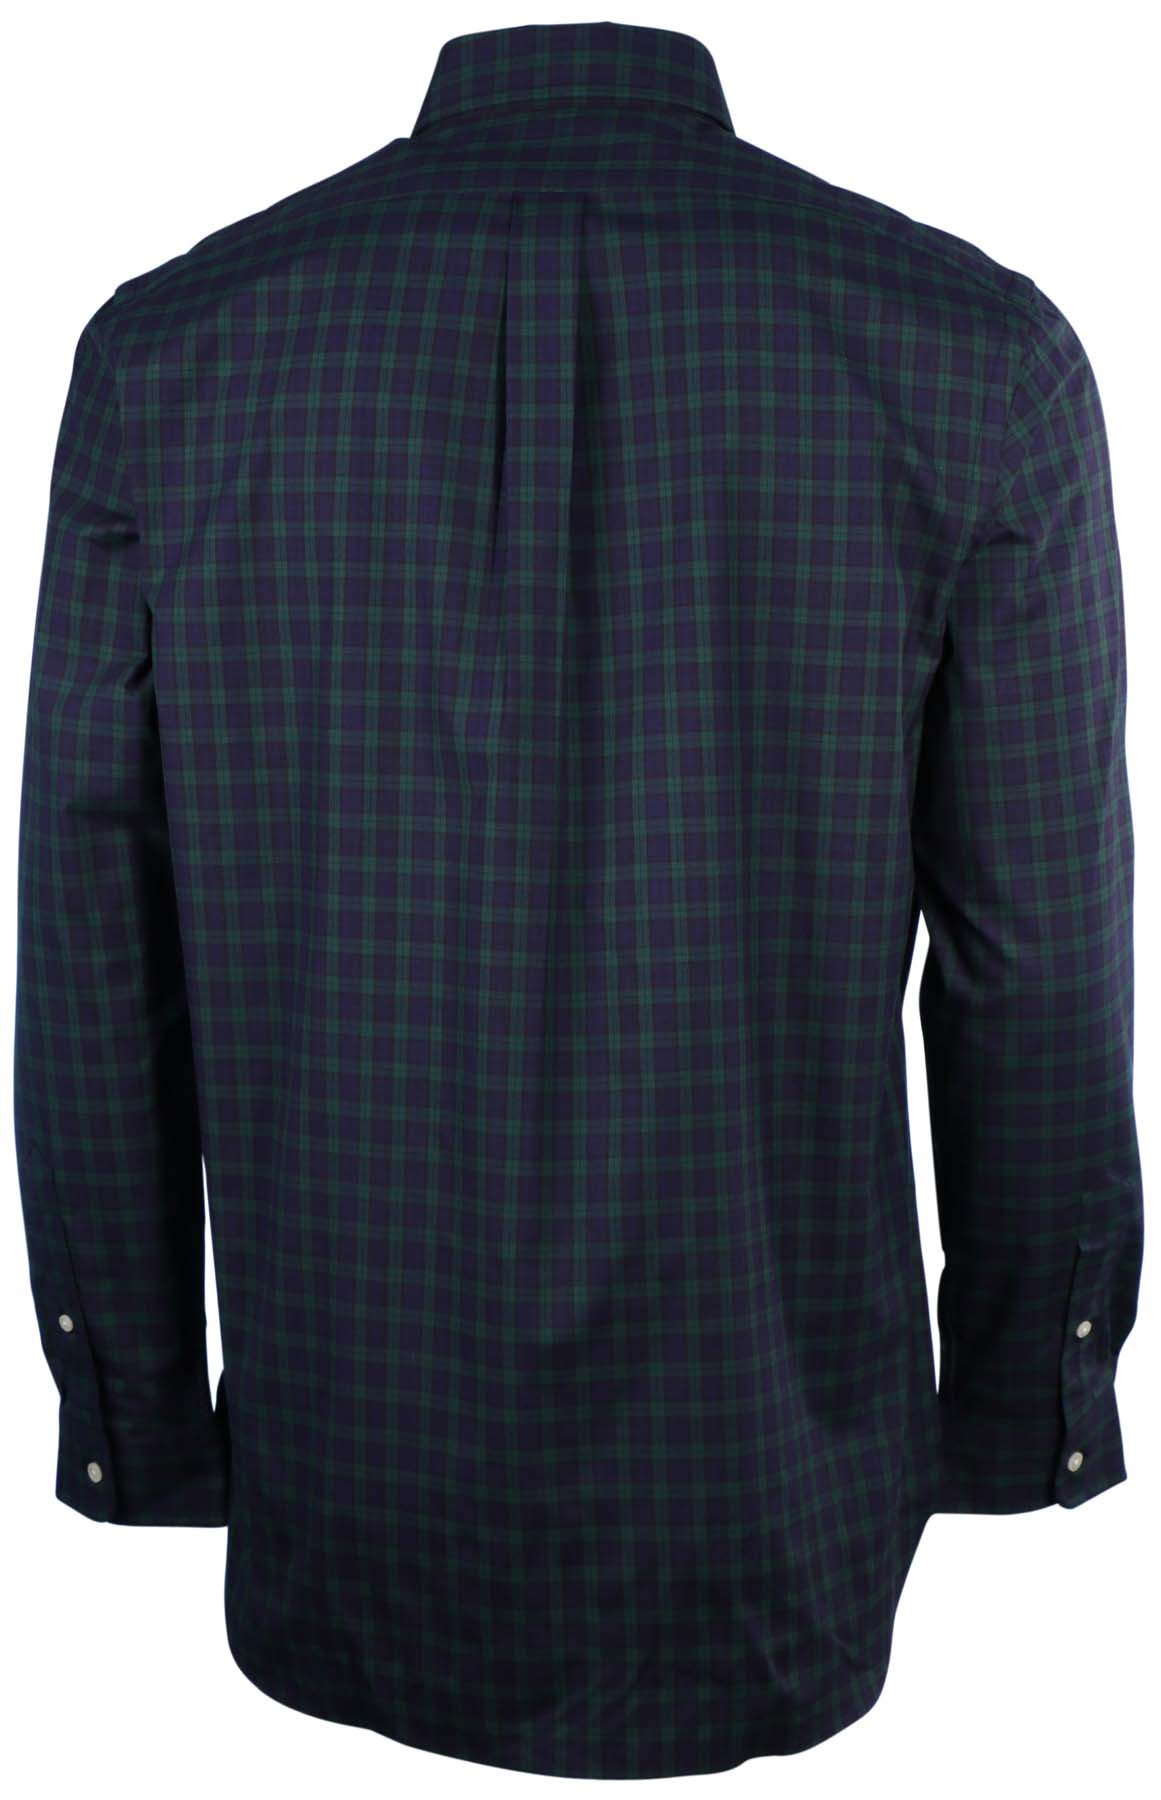 Polo Ralph Lauren Men 39 S Plaid Tartan Button Down Shirt Ebay